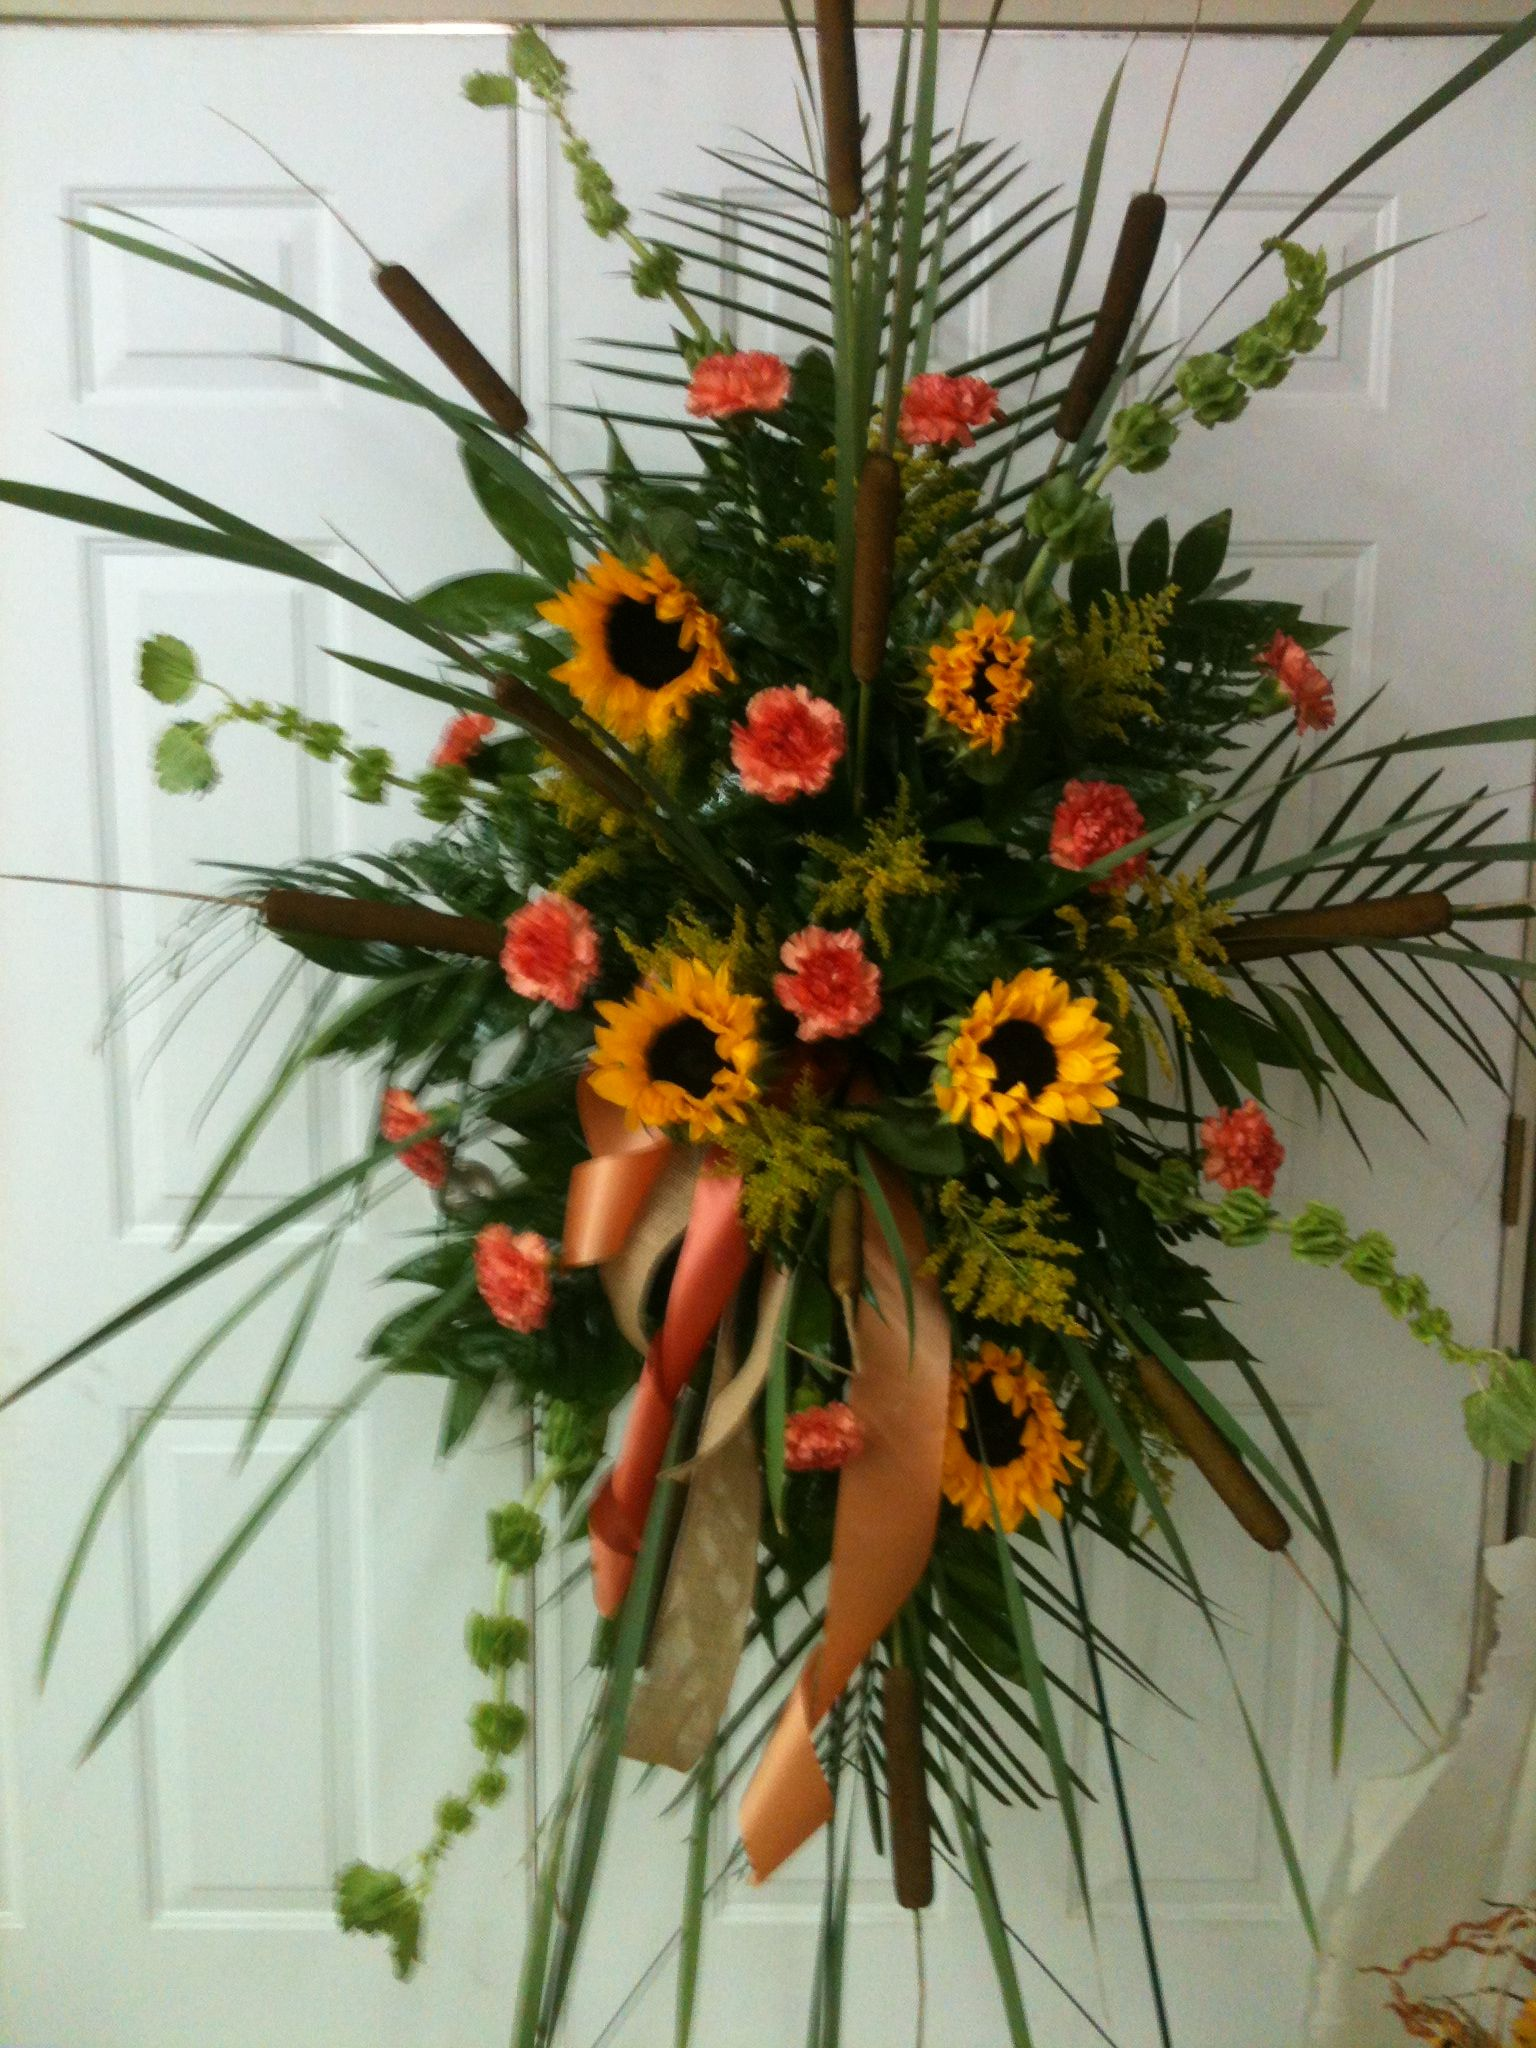 Funeral spray with cattails sunflowers orange carnations and bells funeral spray with cattails sunflowers orange carnations and bells of ireland izmirmasajfo